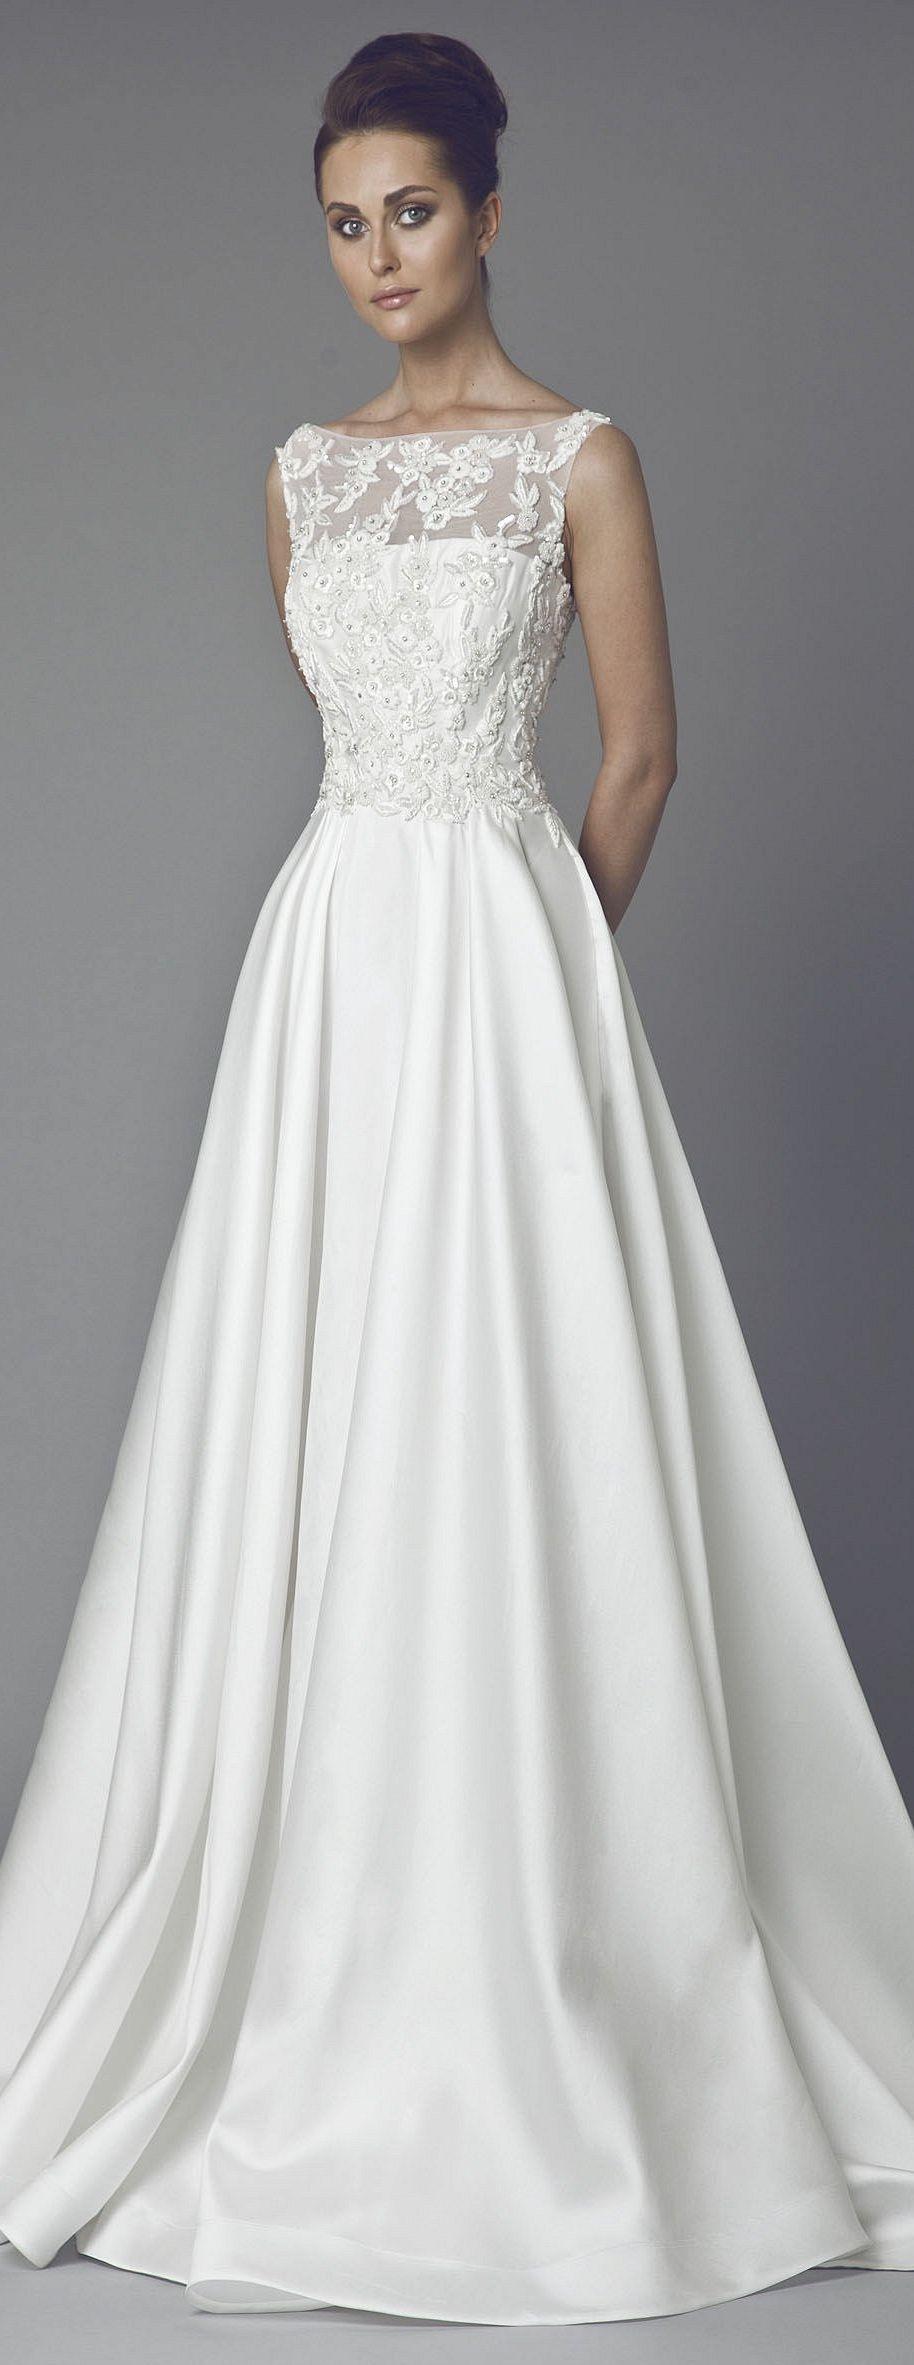 Wedding-Dresses-0536